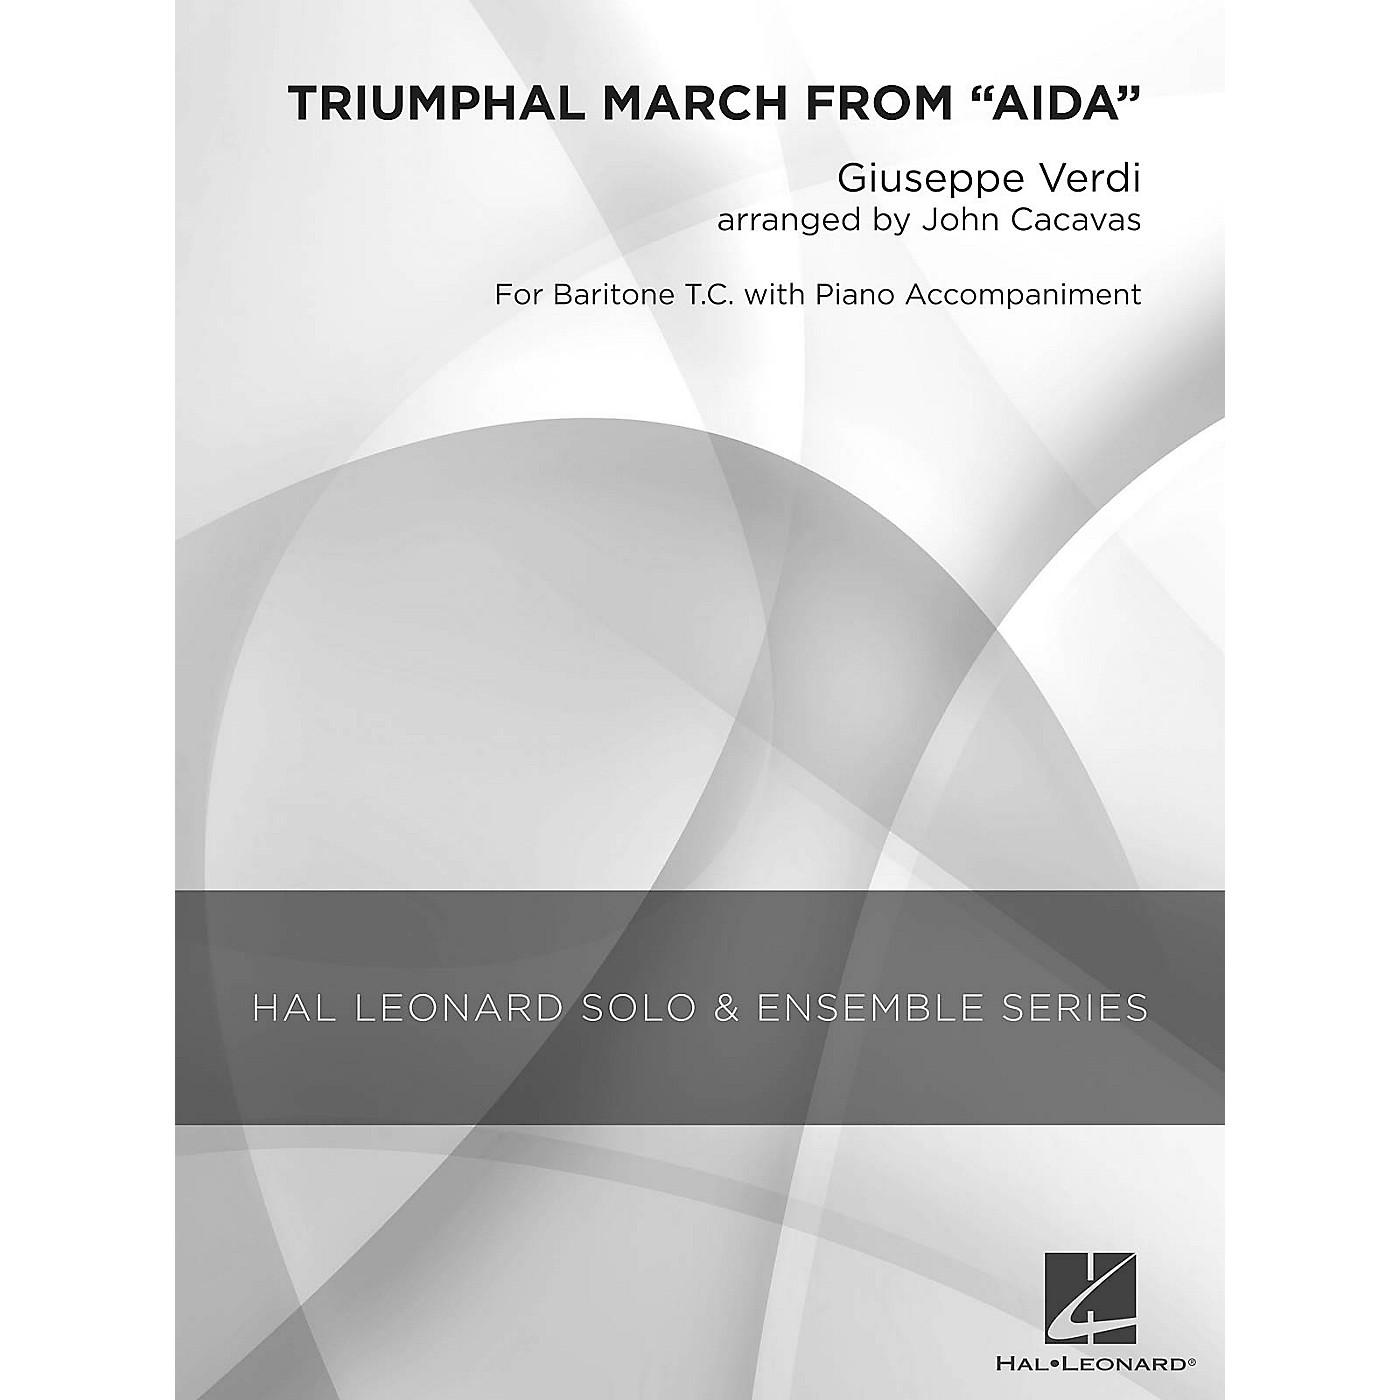 Hal Leonard Triumphal March from Aïda (Grade 2 Baritone T.C. Solo) Concert Band Level 2 Arranged by John Cacavas thumbnail